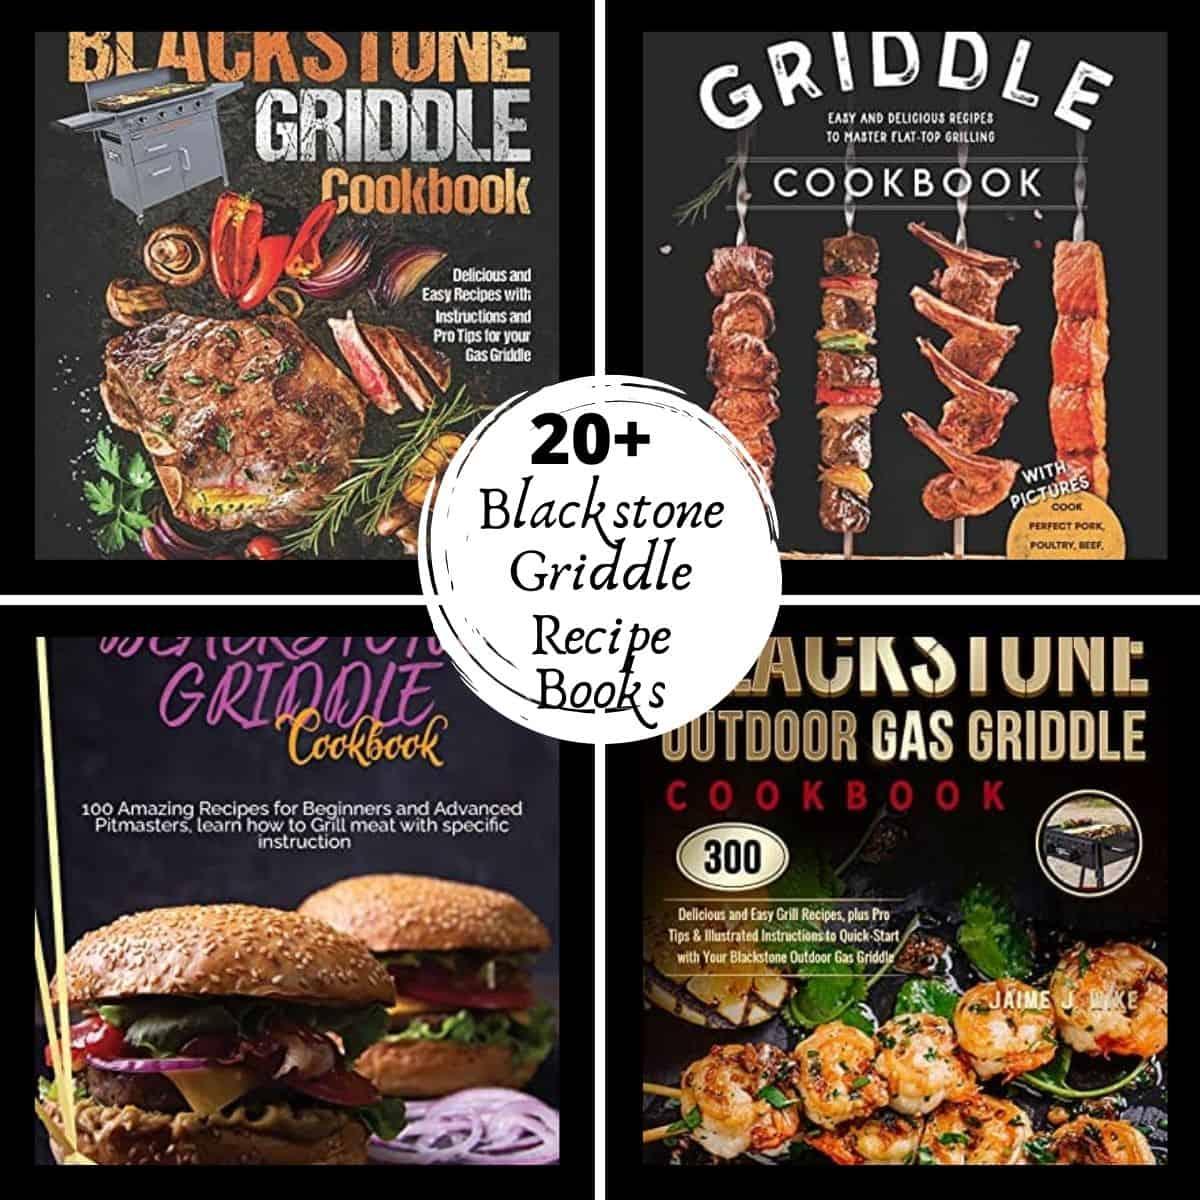 20+ Blackstone Griddle Recipe Books